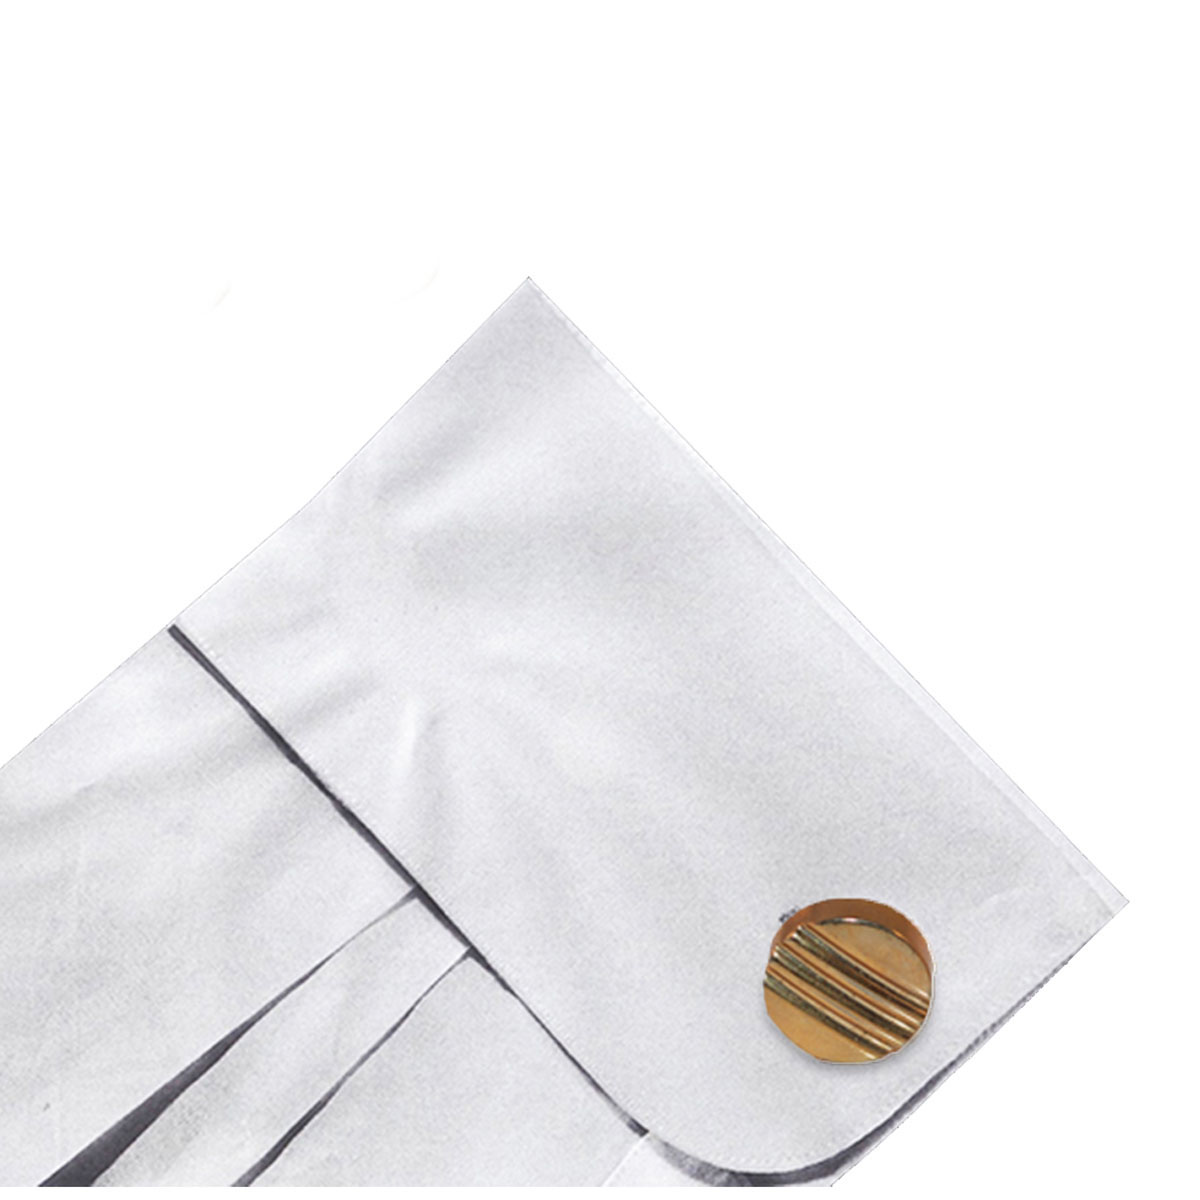 60s gold swank cufflinks